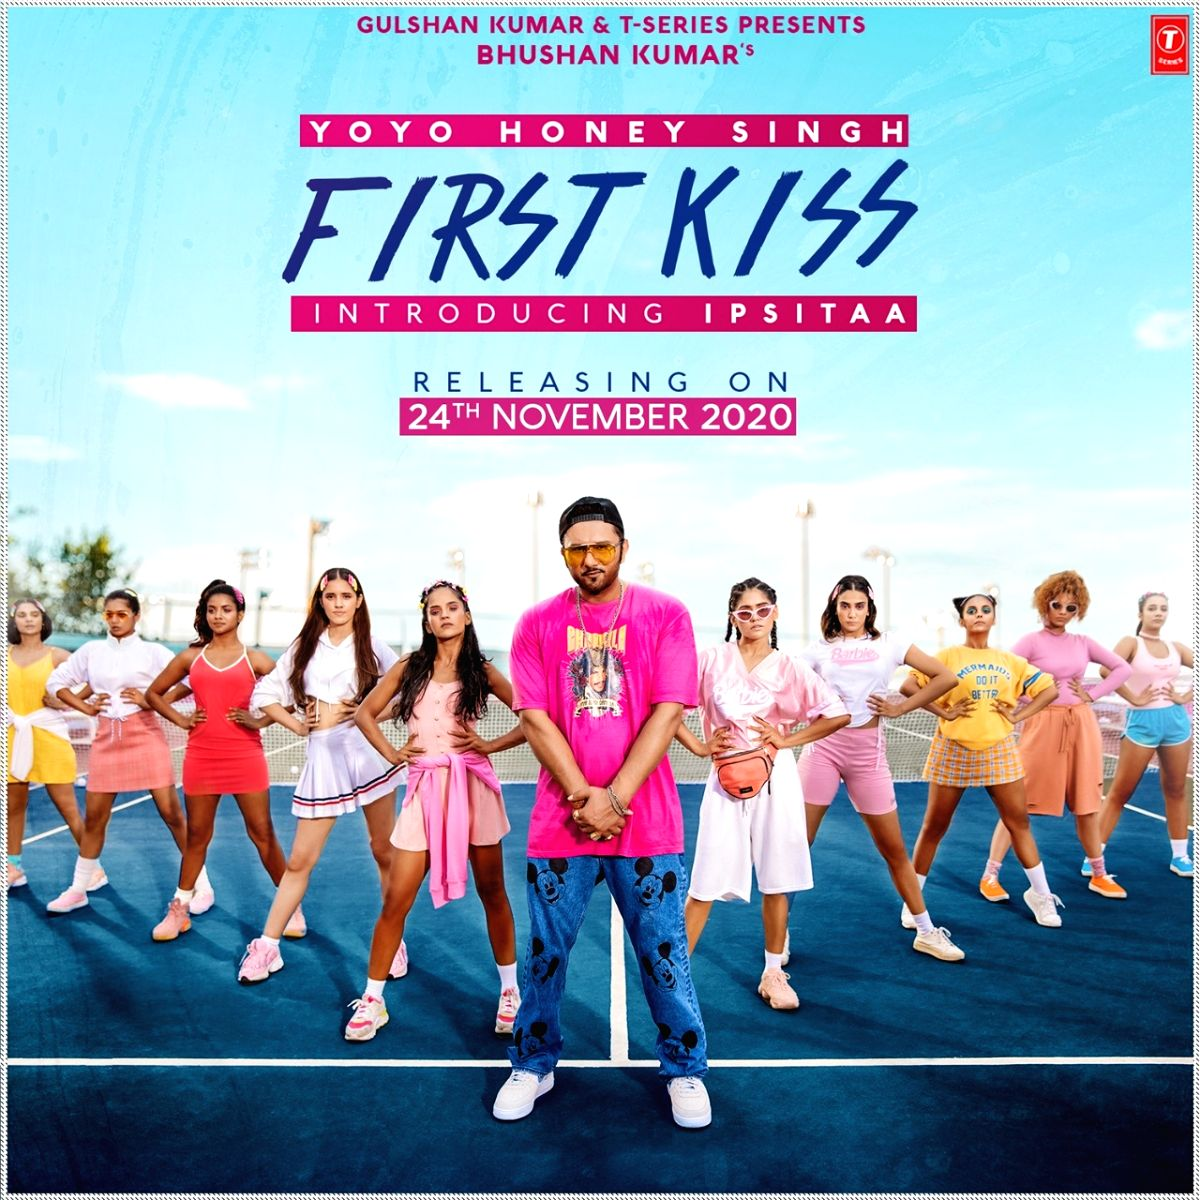 Yo Yo Honey Singh launches singer Ipsitaa in 'First kiss'.